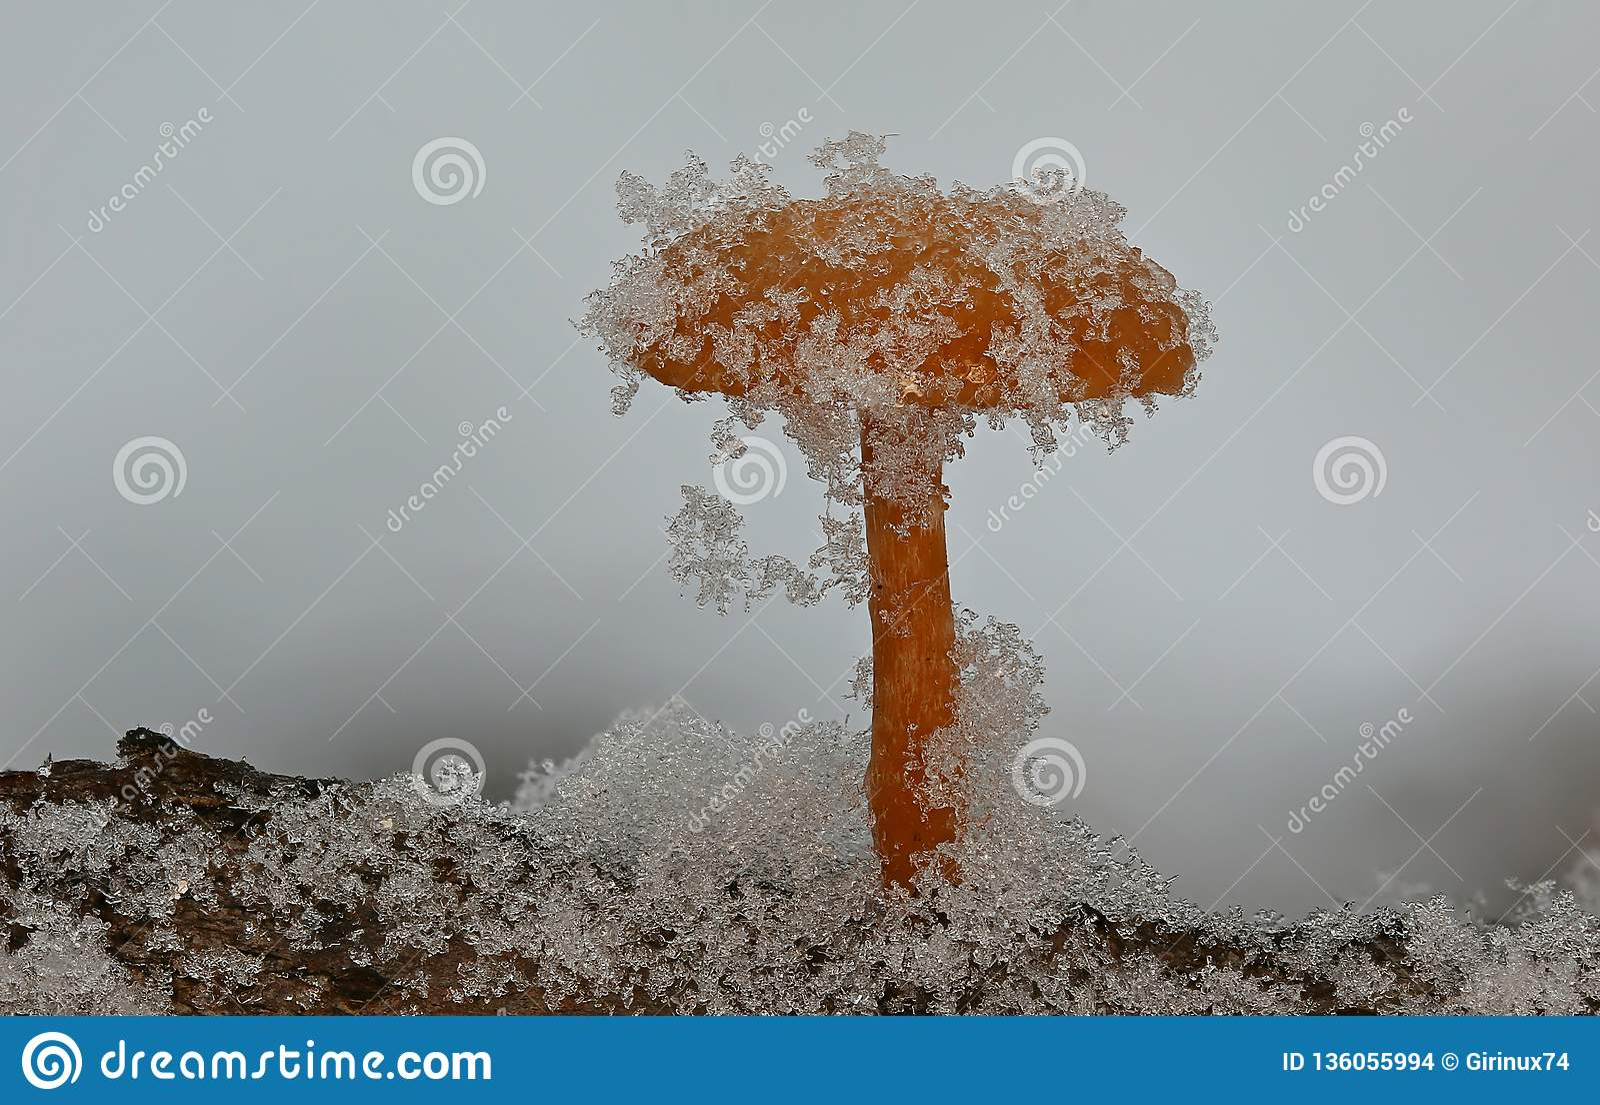 Cogumelos de inverno sob a neve macia